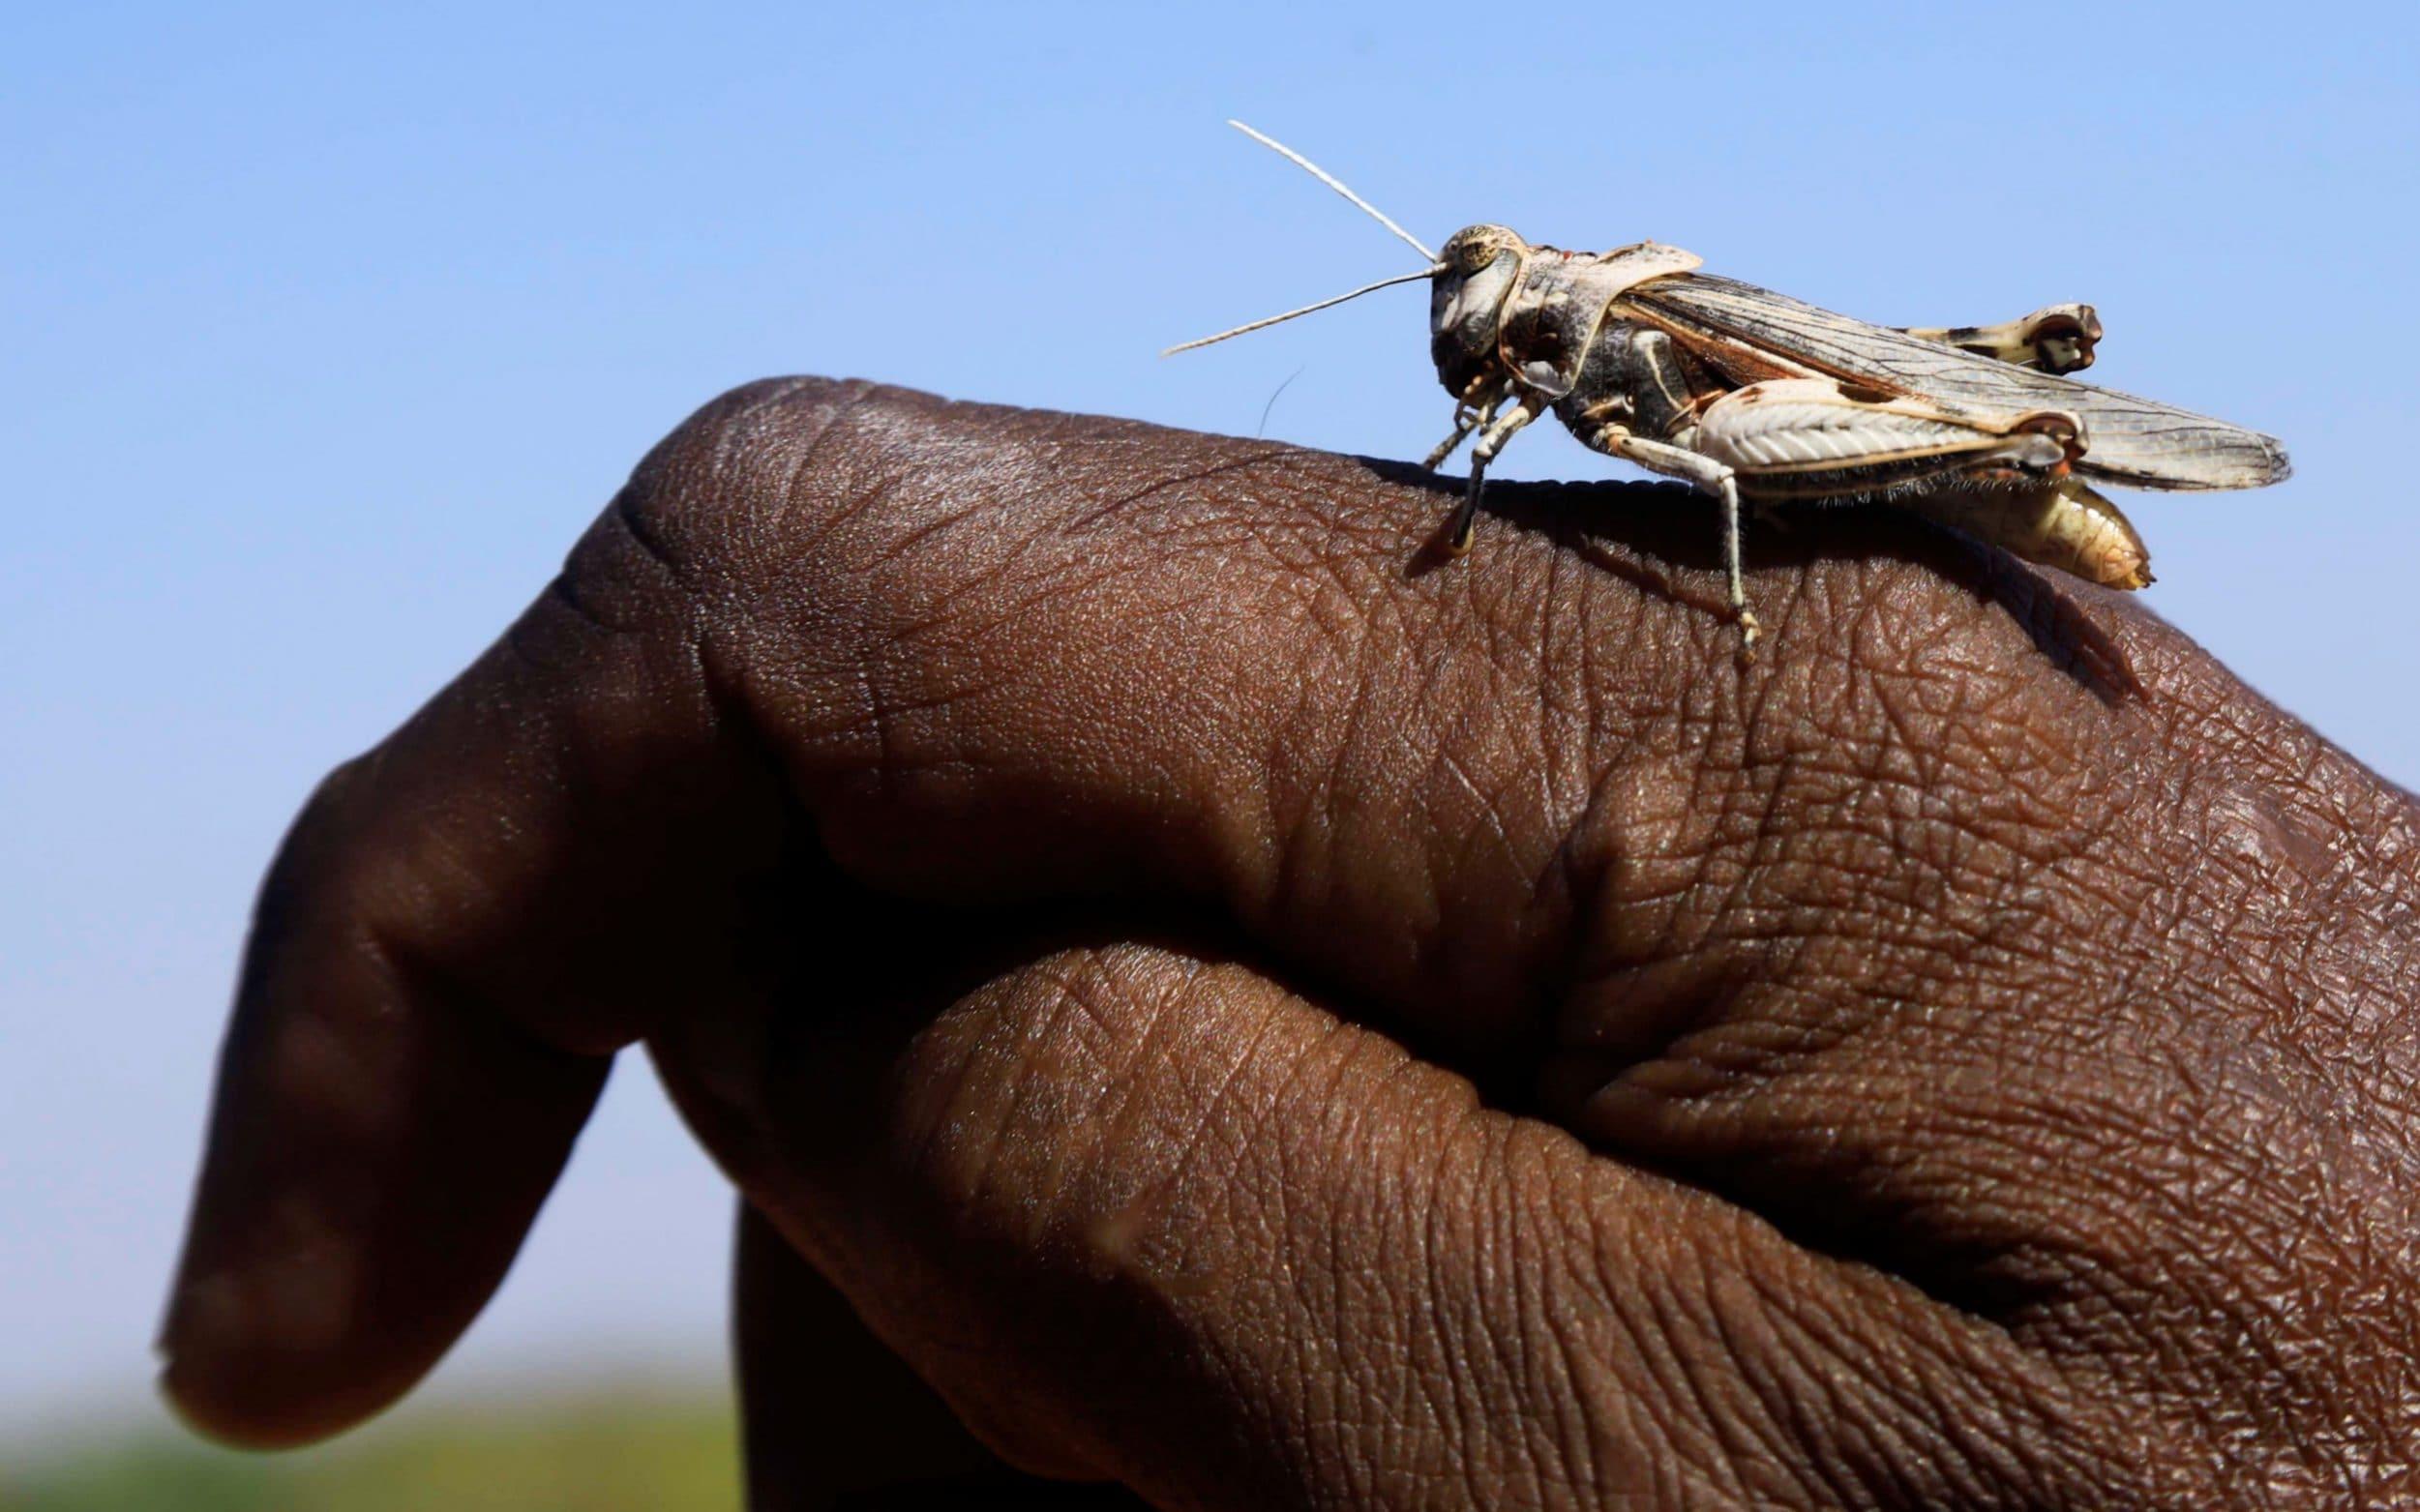 Al Shabaab shoot locusts with machine guns as Somalia battles biggest swarms in 25 years